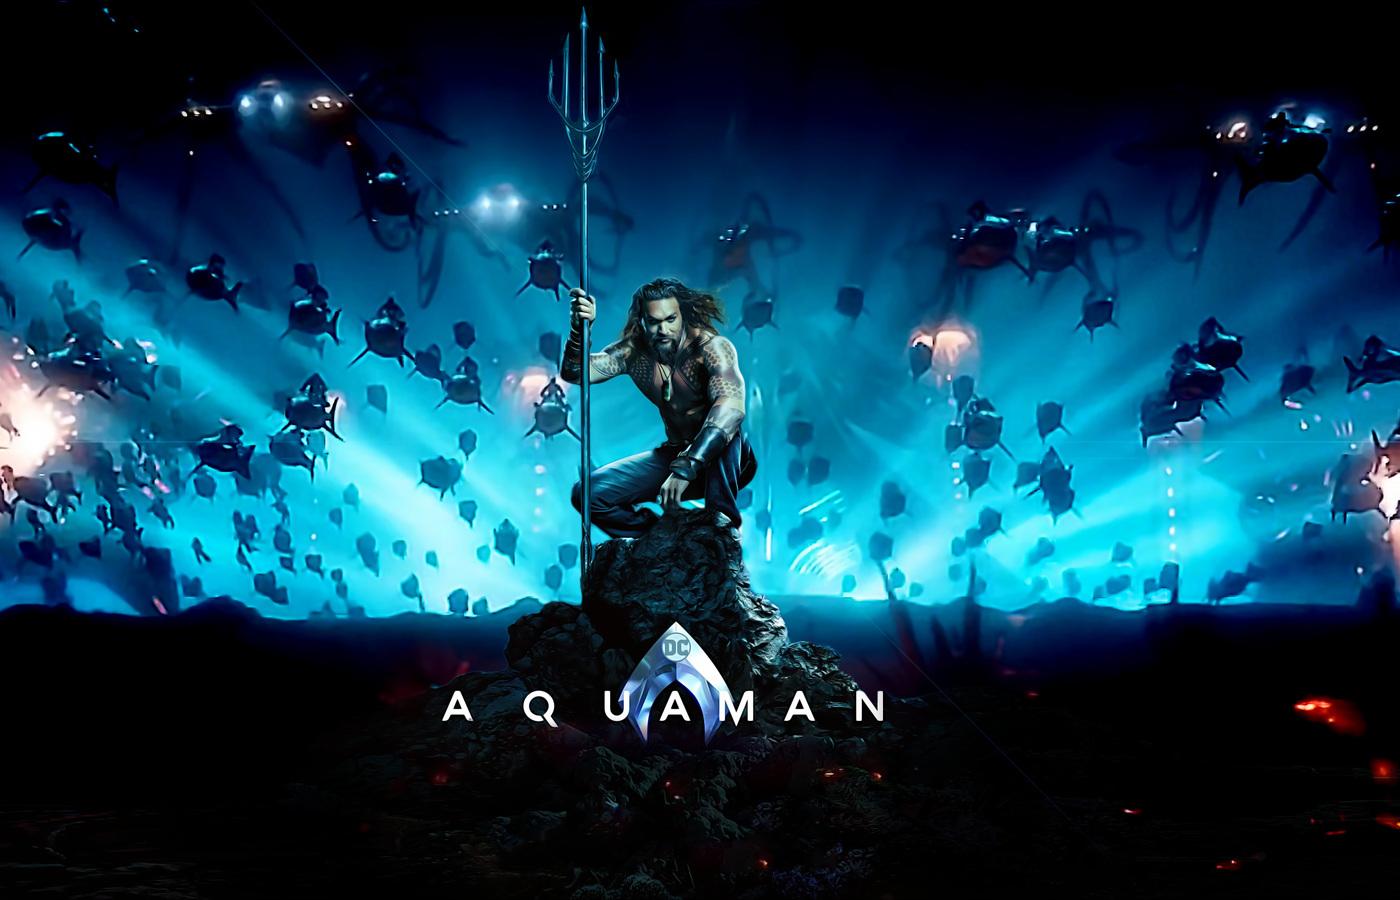 aquaman-movie-poster-6g.jpg